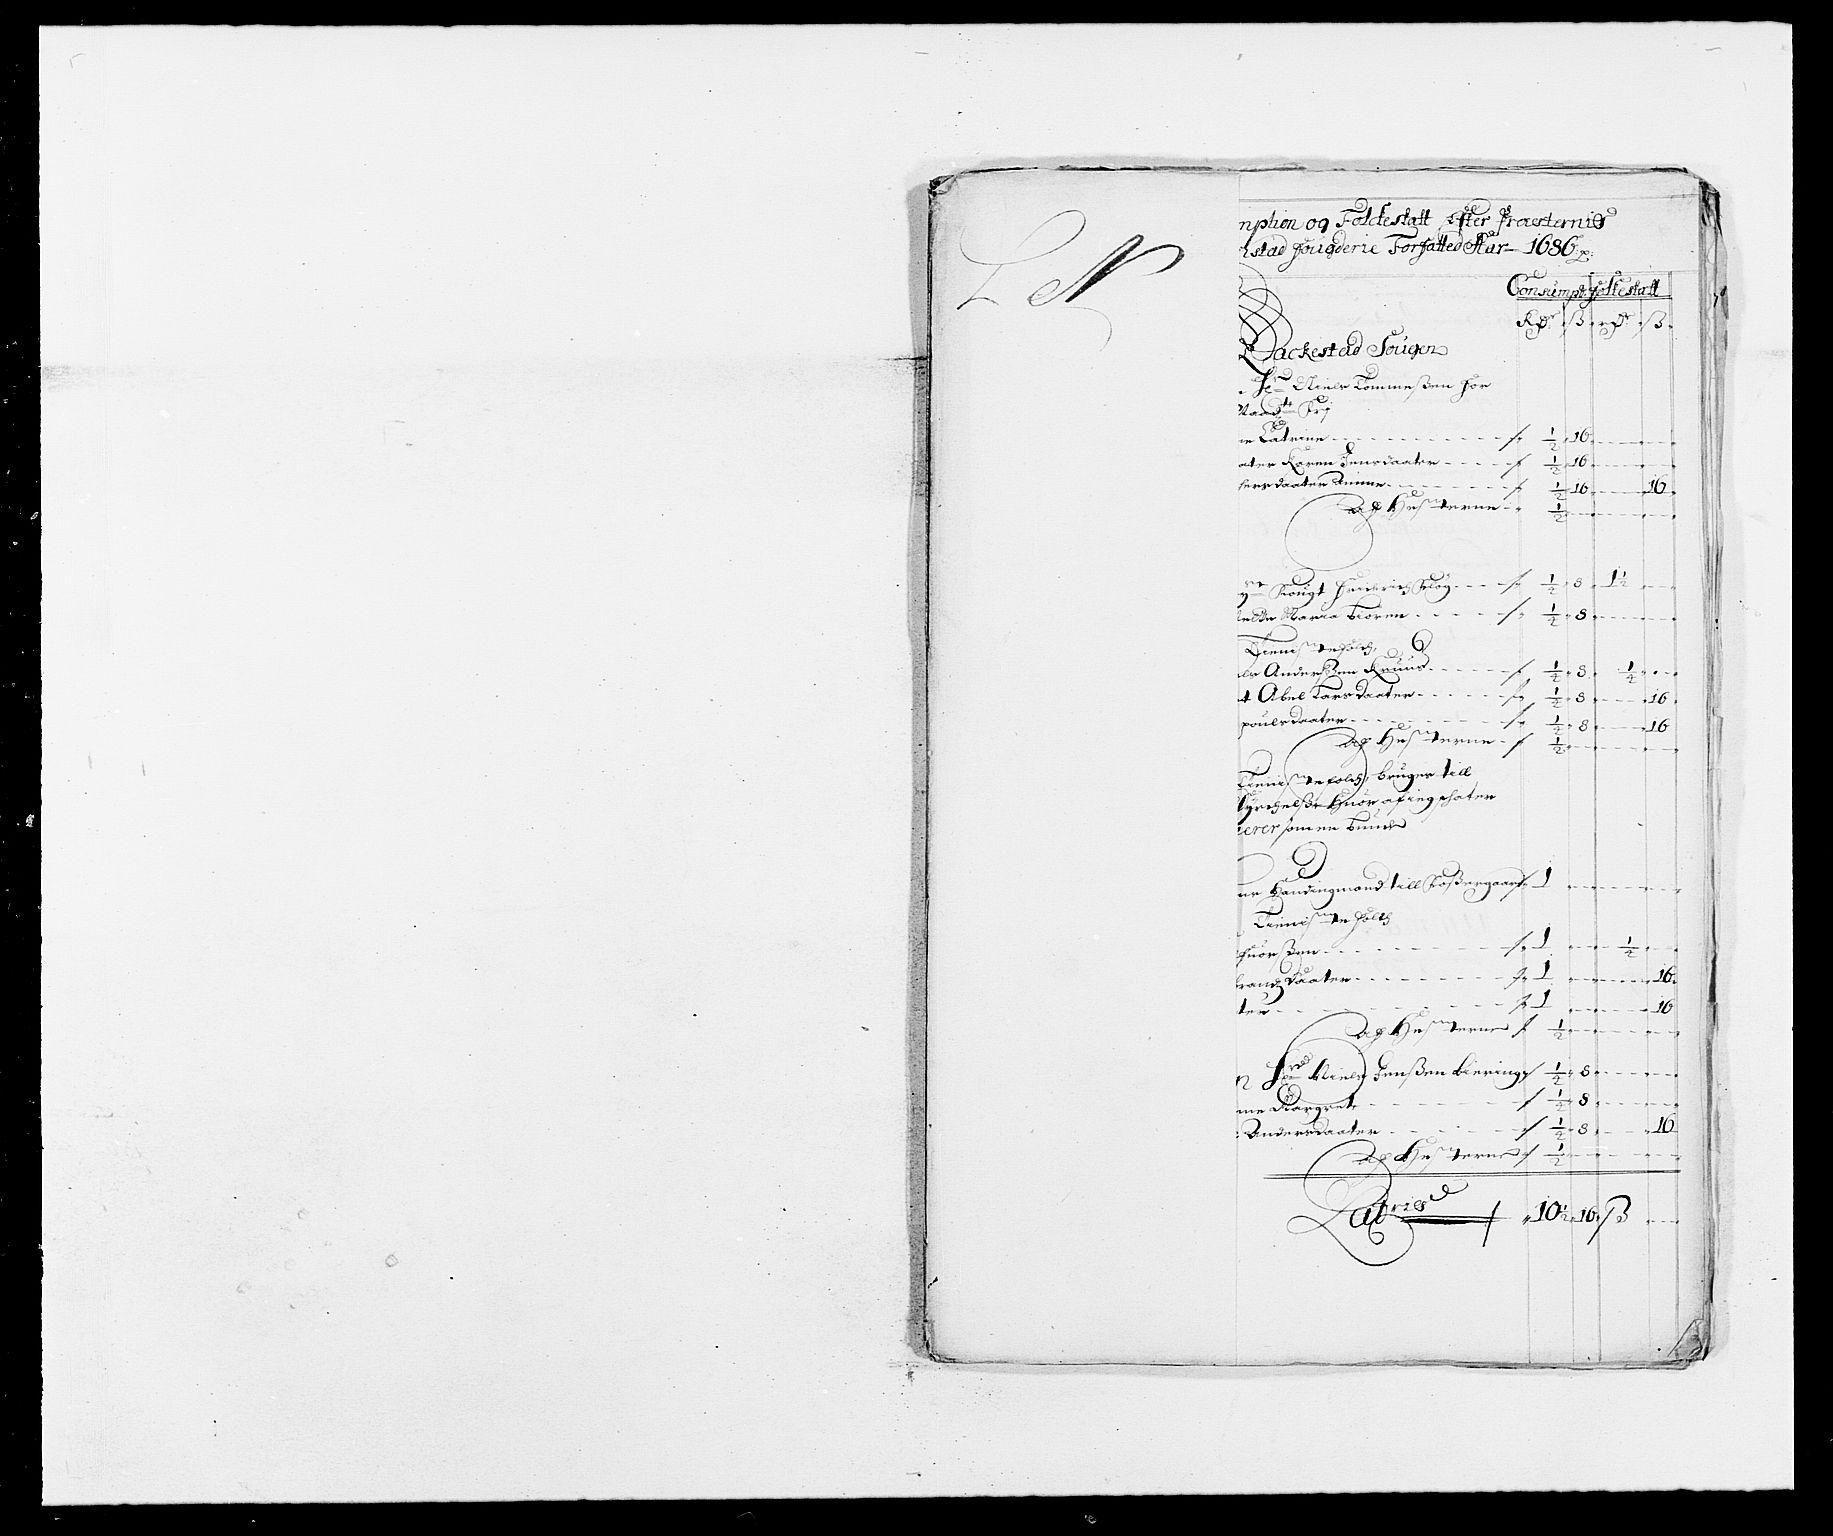 RA, Rentekammeret inntil 1814, Reviderte regnskaper, Fogderegnskap, R05/L0275: Fogderegnskap Rakkestad, 1685-1686, s. 273